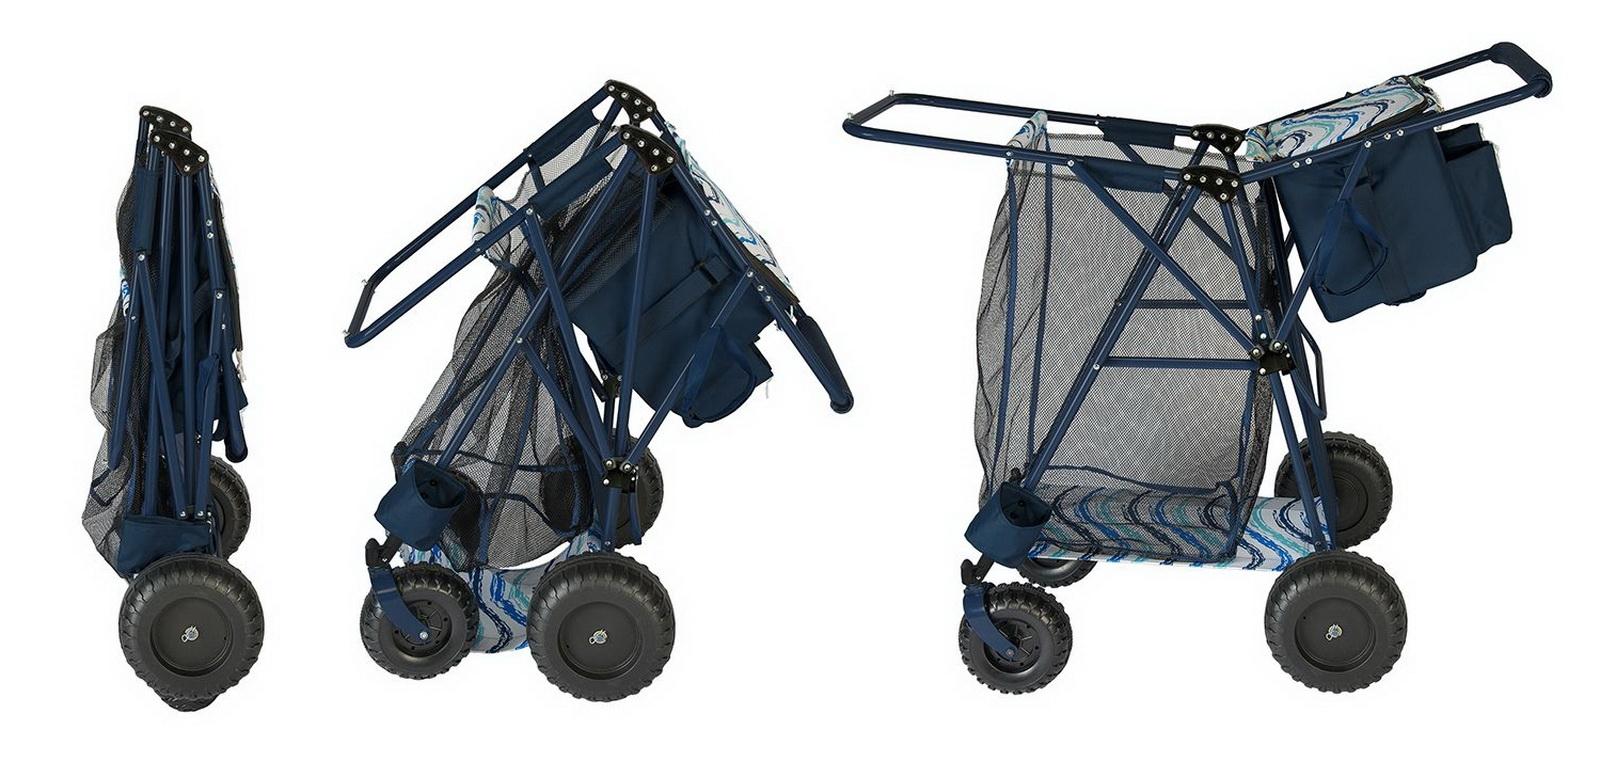 Big Folding Beach Cart  Portable Cooler Shopping Gear